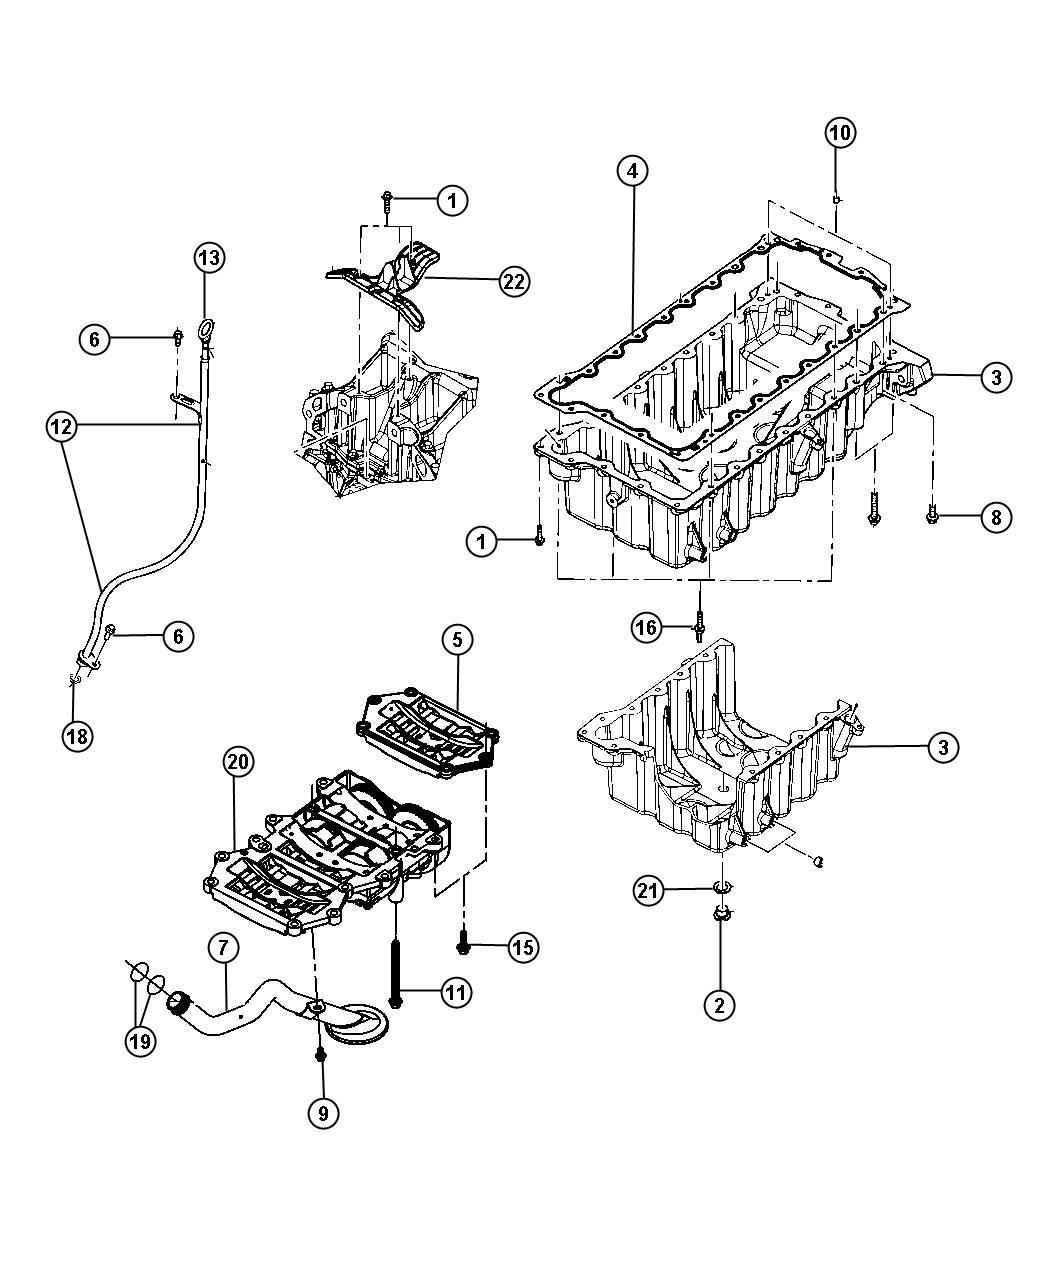 Chrysler Pt Cruiser Plug Oil Drain Enr Fluids Filters